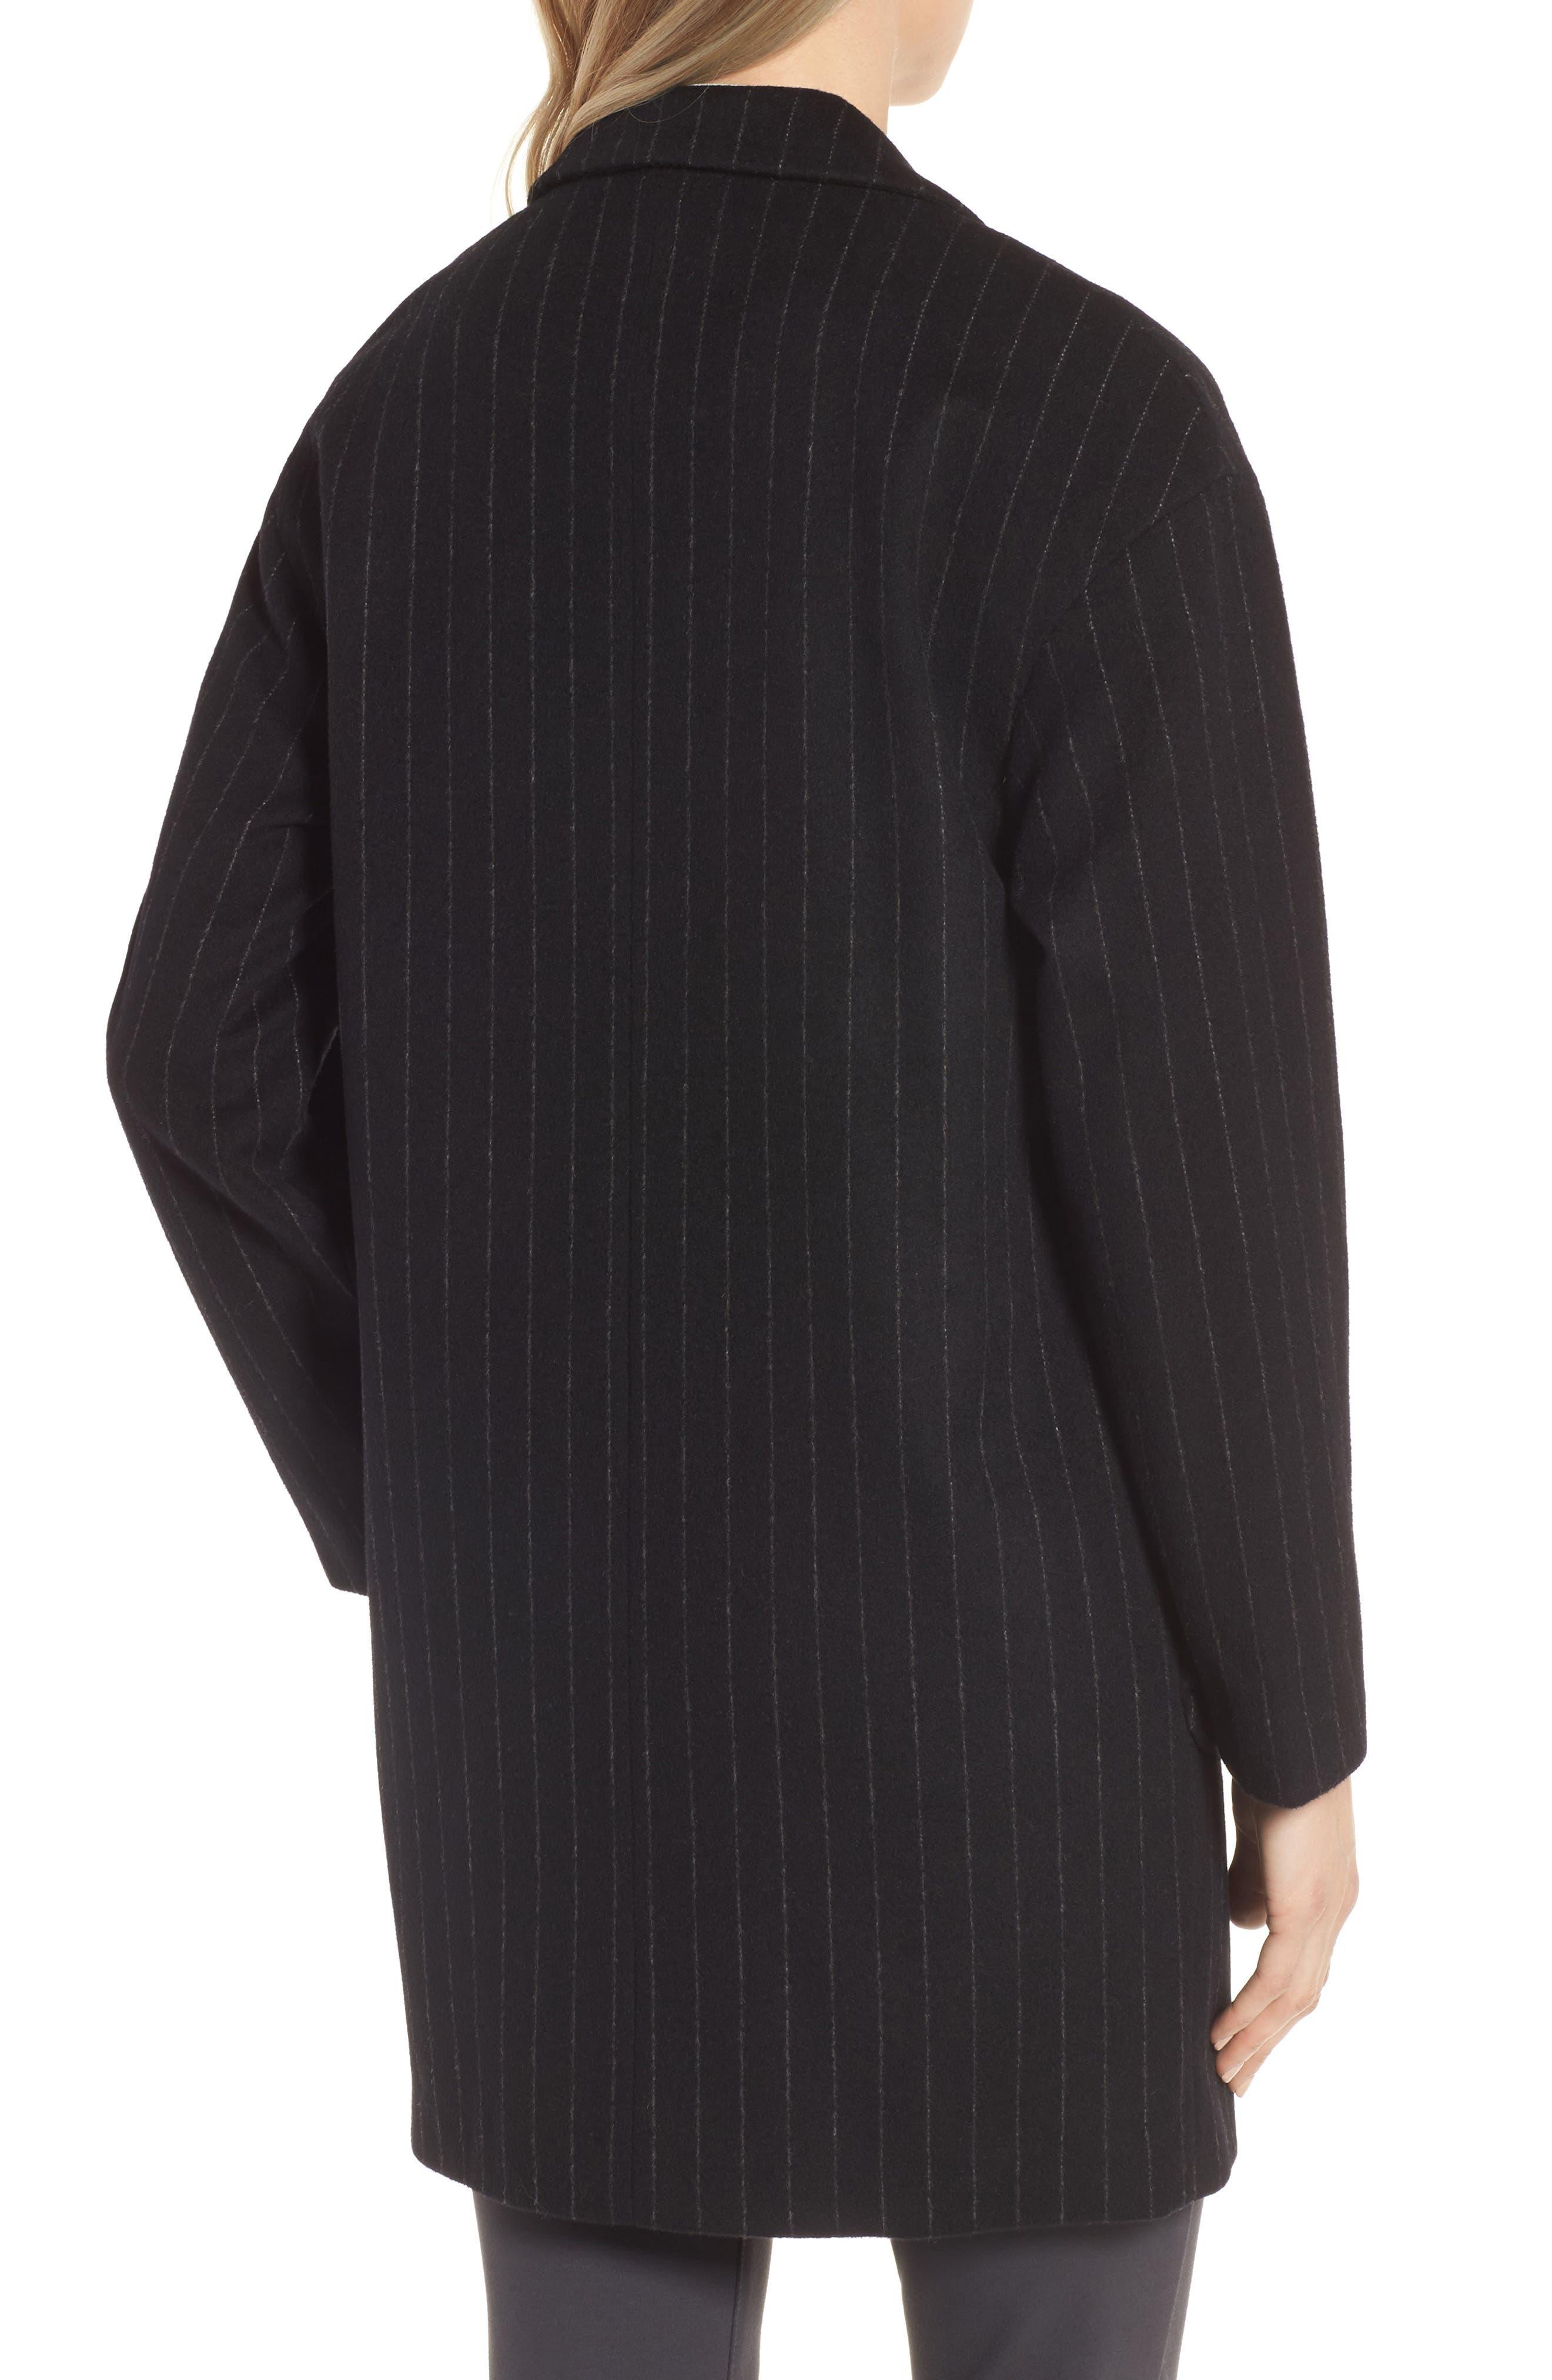 DKNY Pinstripe Wool Blend Coat,                             Alternate thumbnail 2, color,                             Black